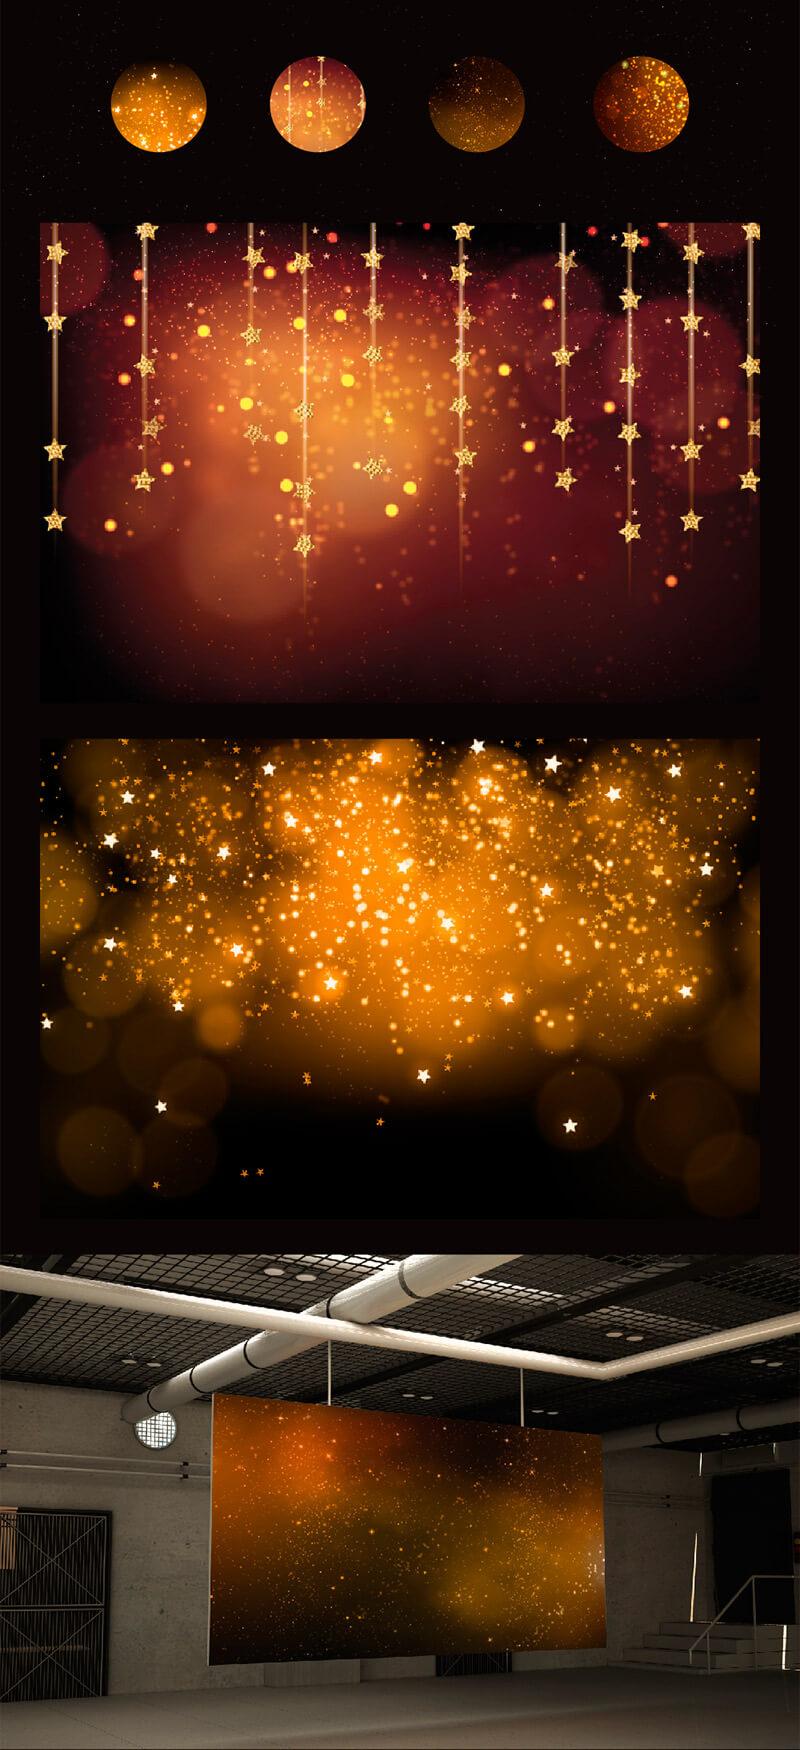 FREE-Glitter-wallpaper-Preview-01